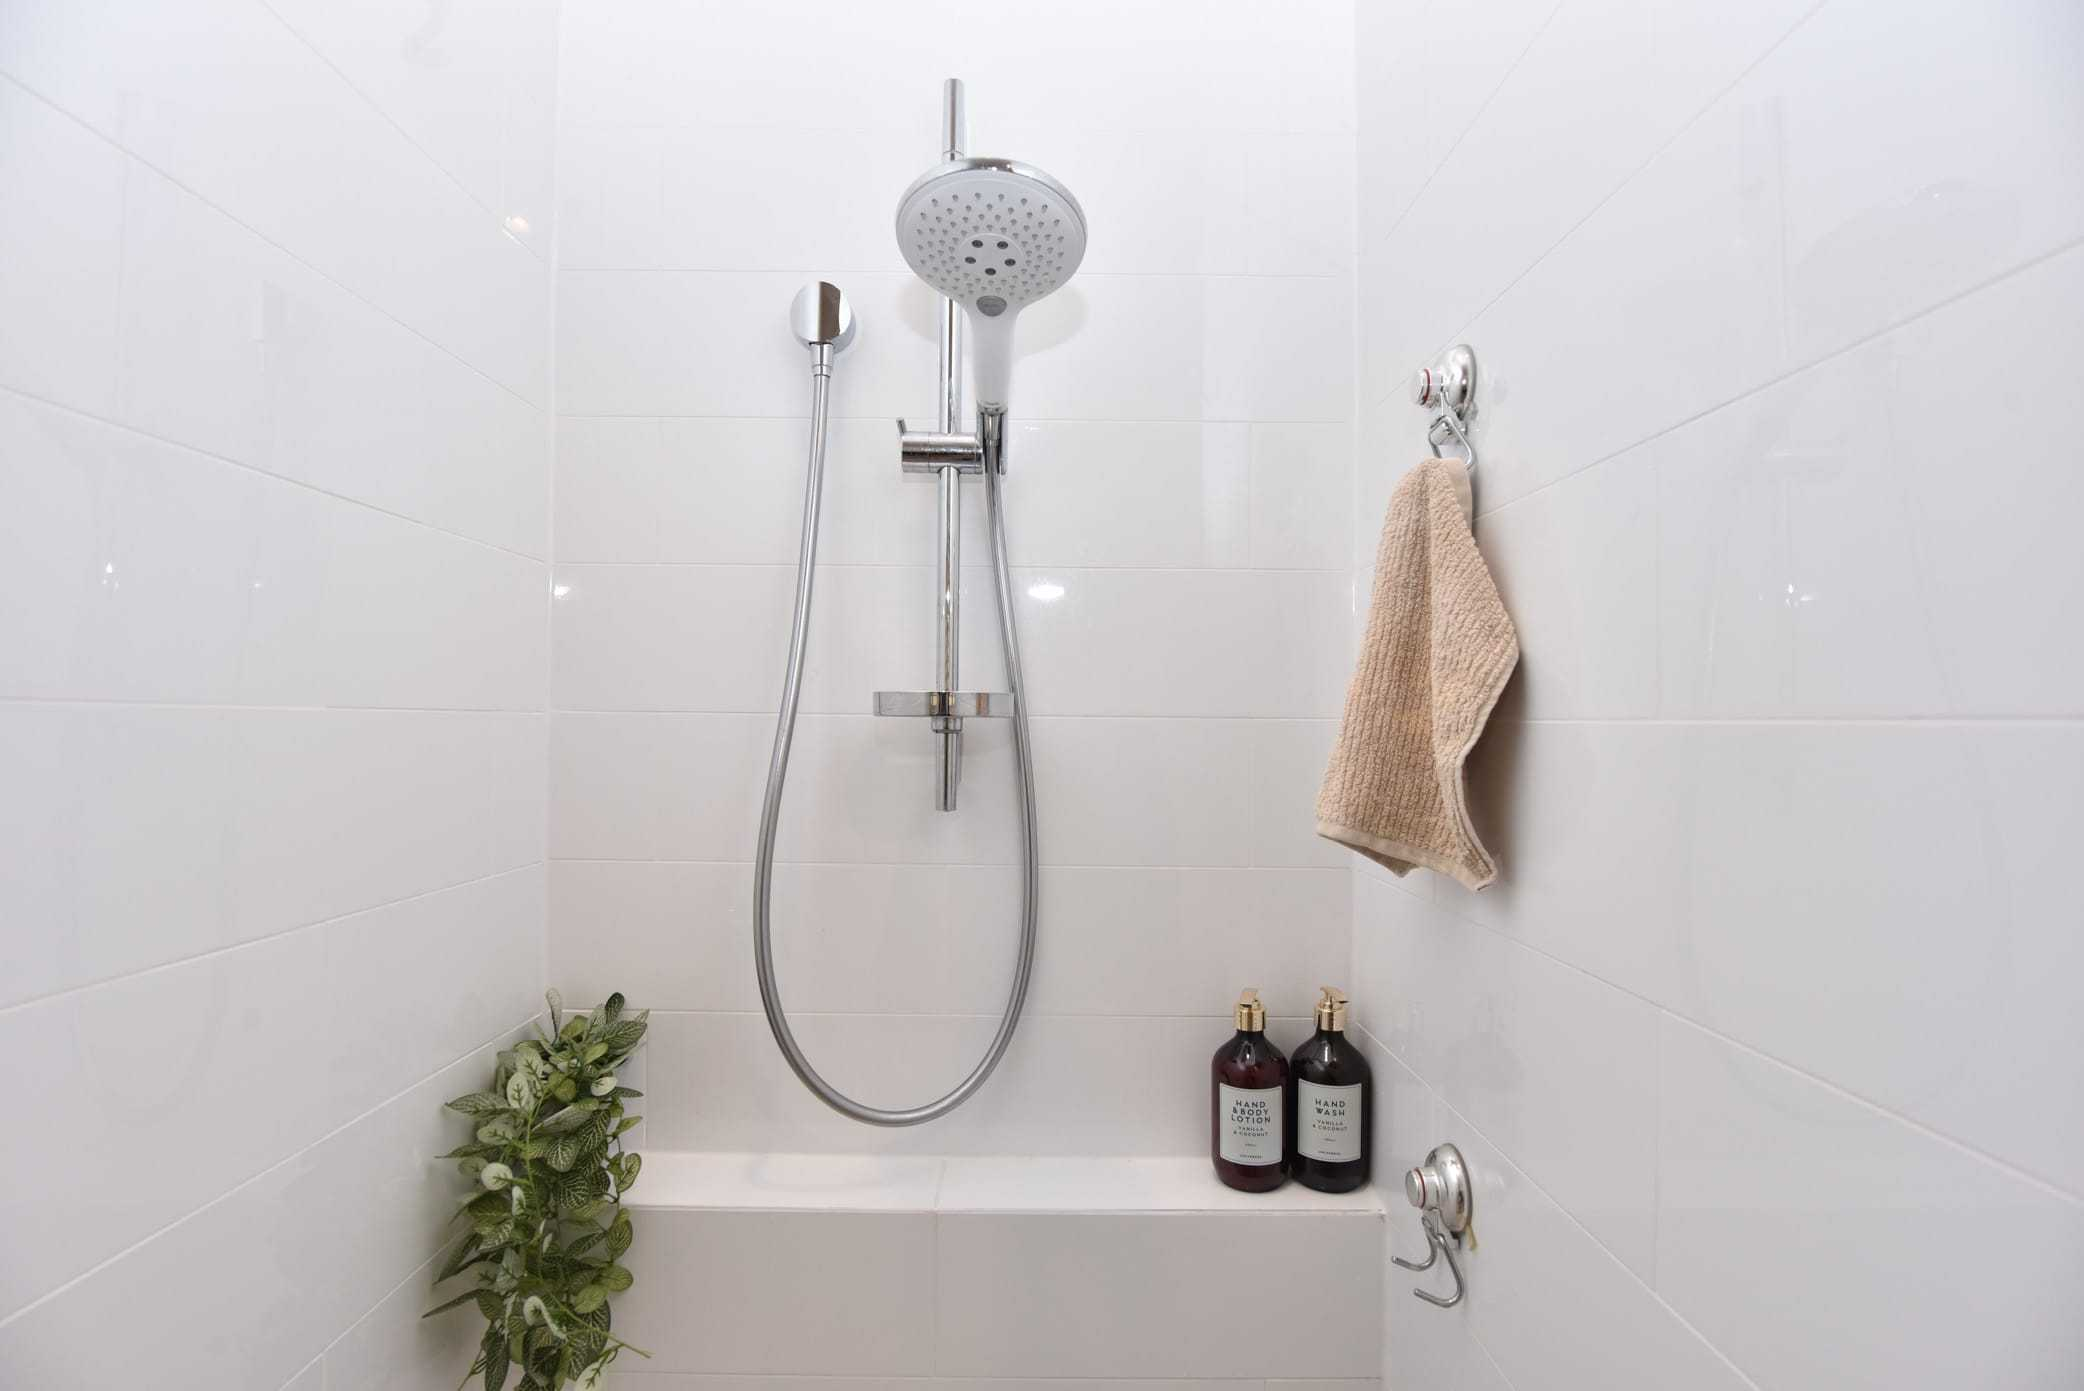 Bathrooms-50.jpg#asset:2321